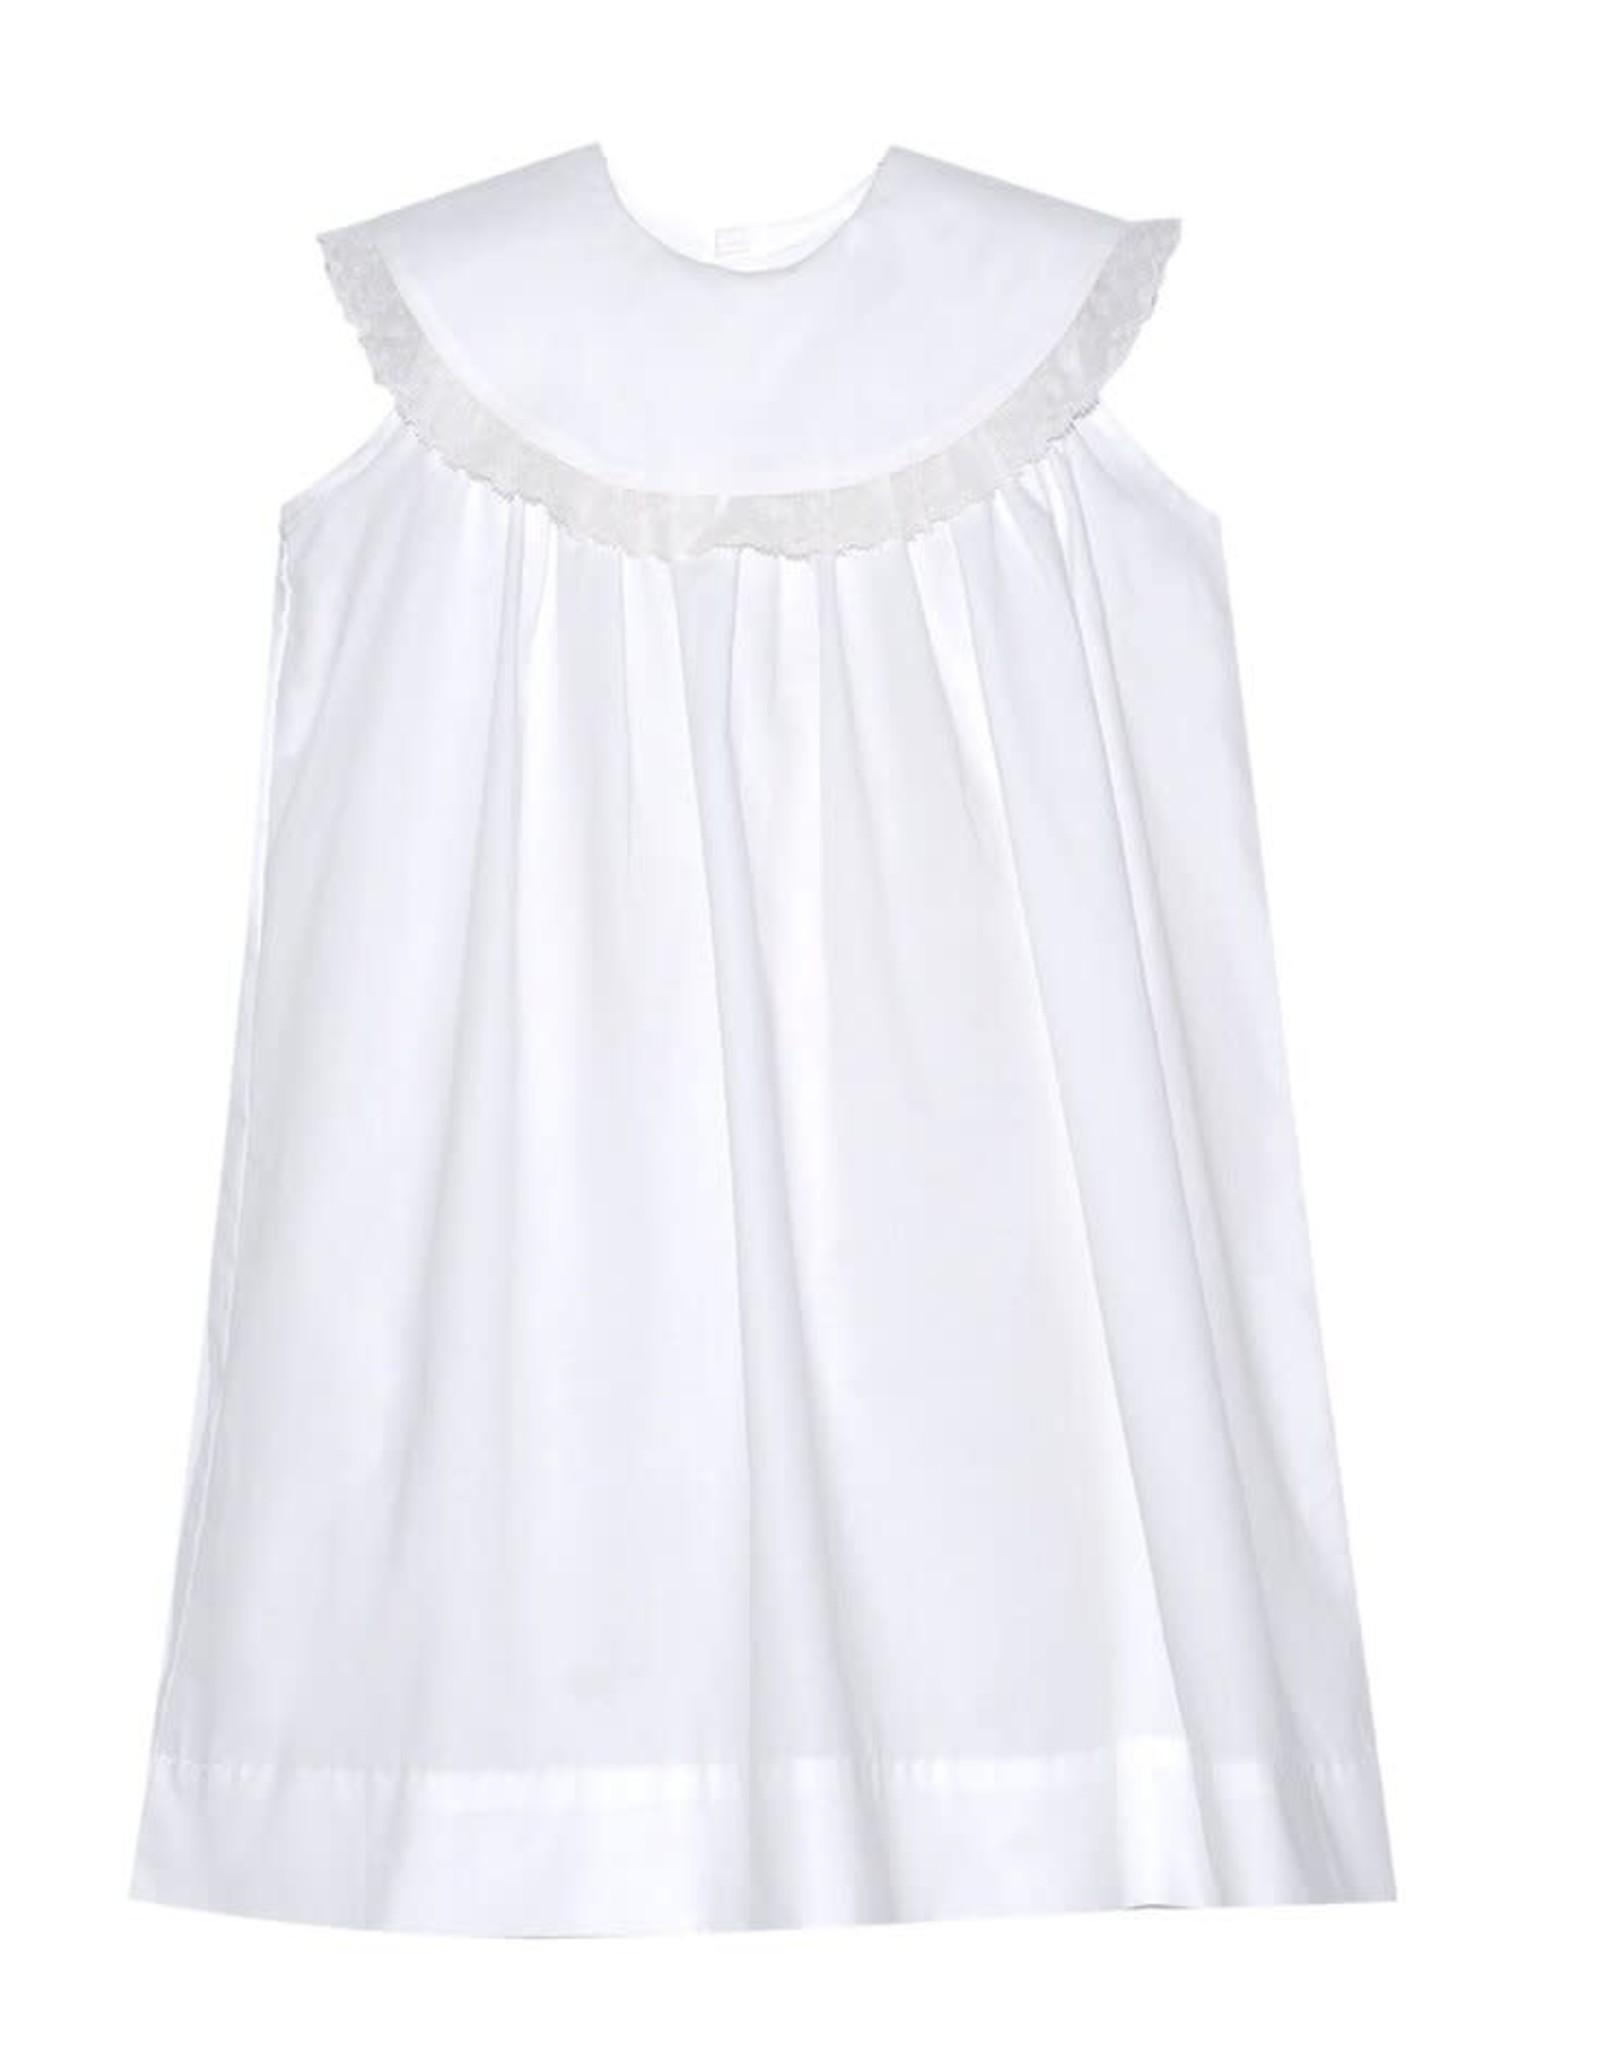 LullabySet The Kinley Dress